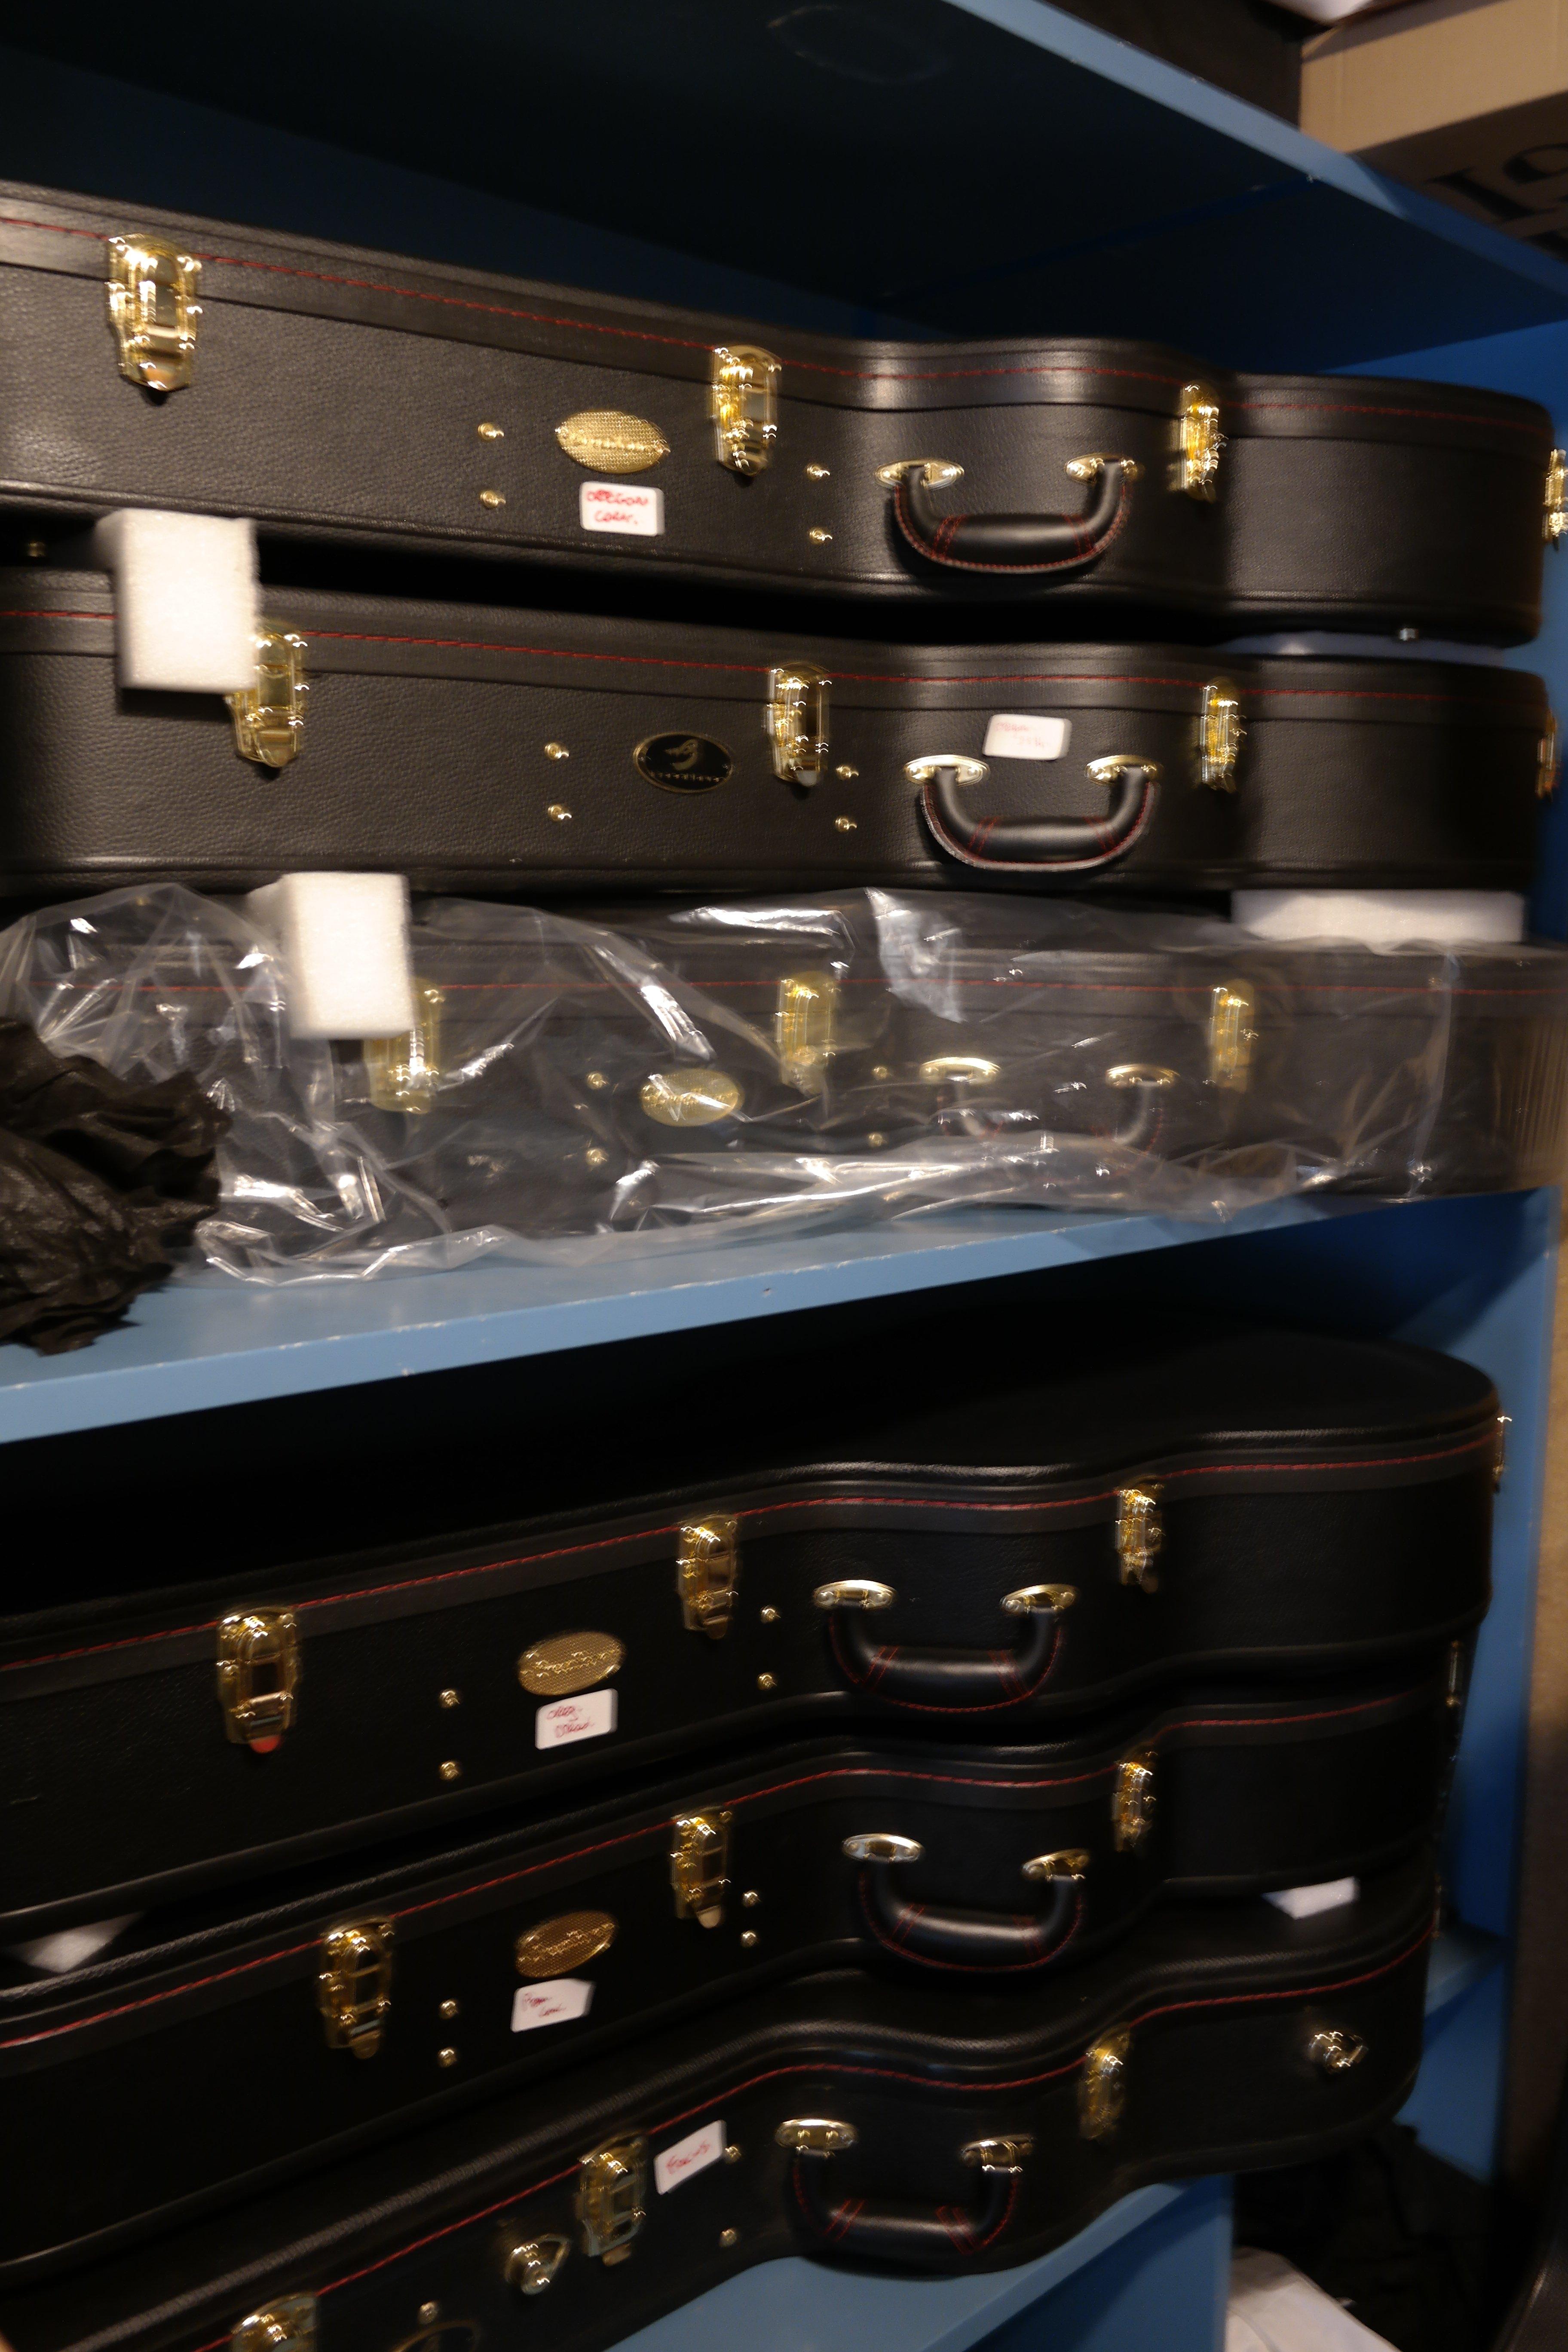 Breedlove koffers